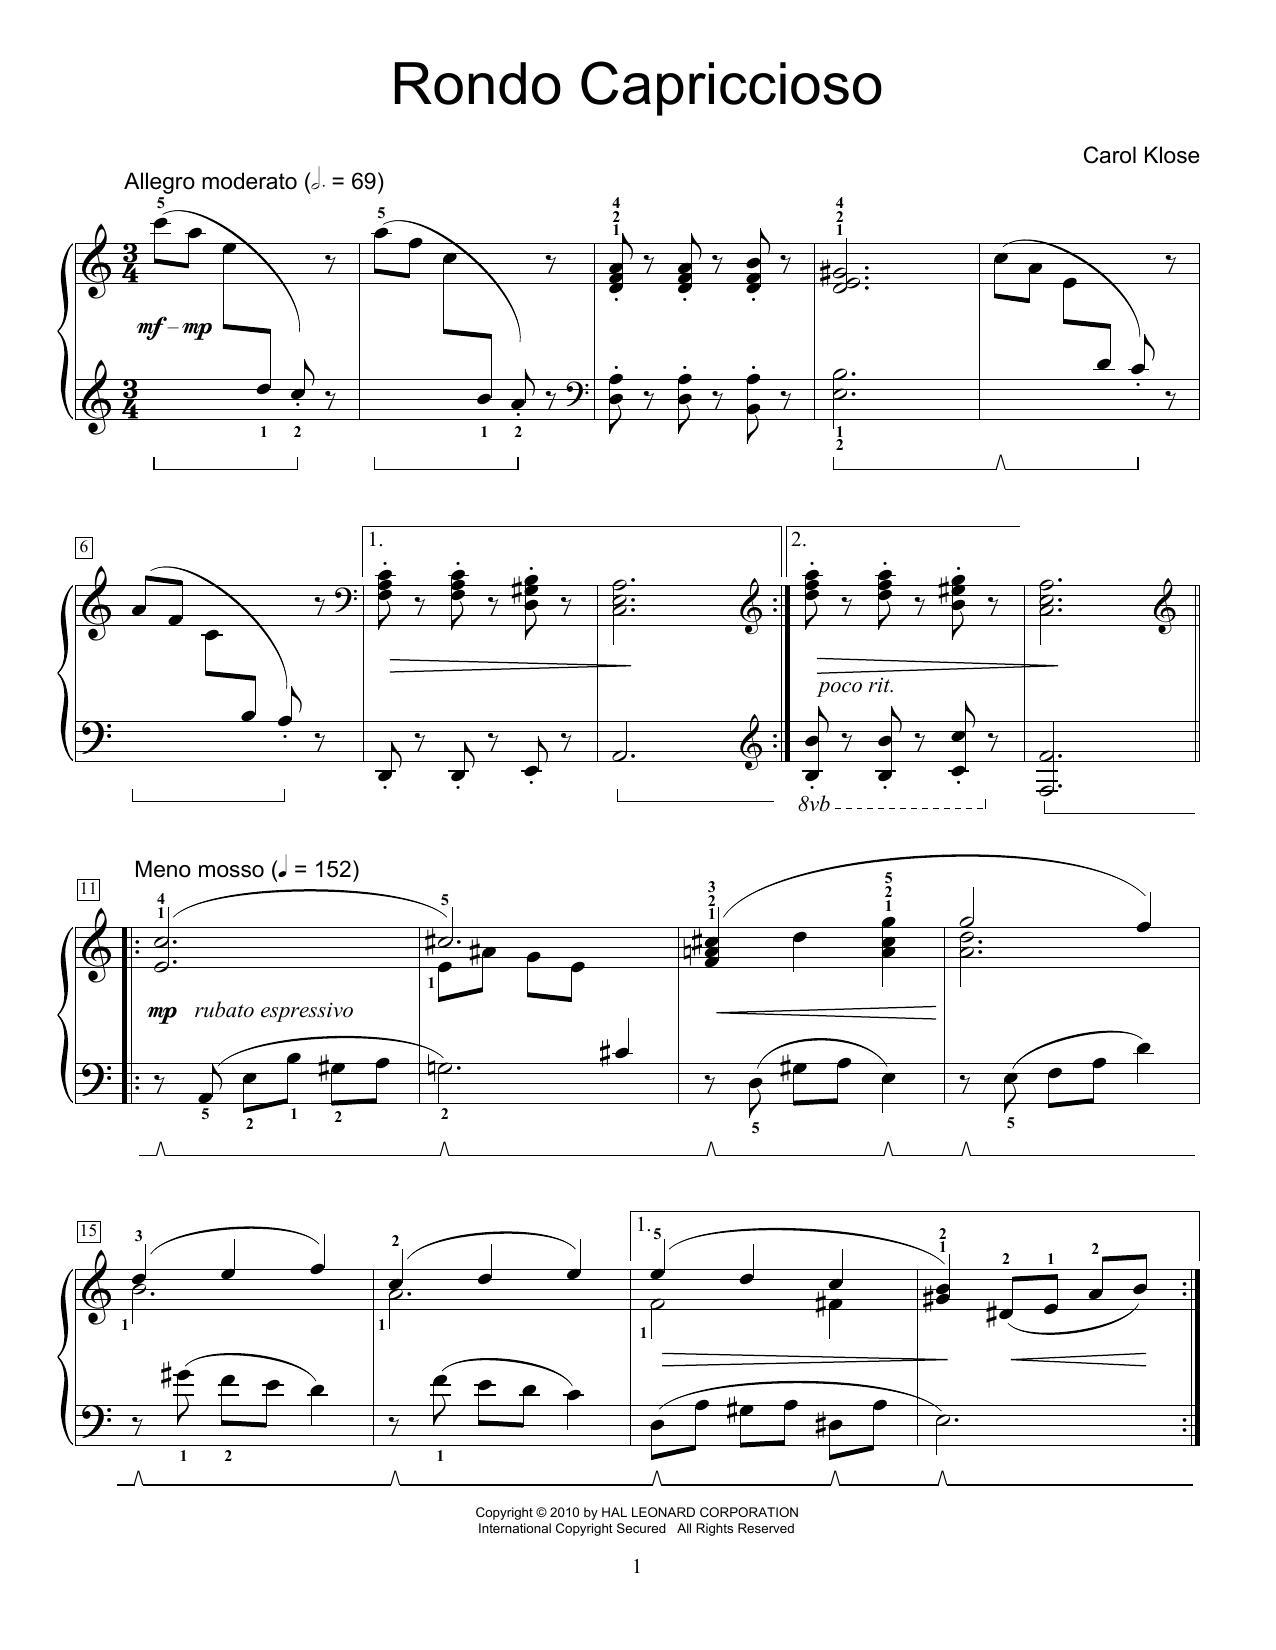 Rondo Capriccioso Sheet Music